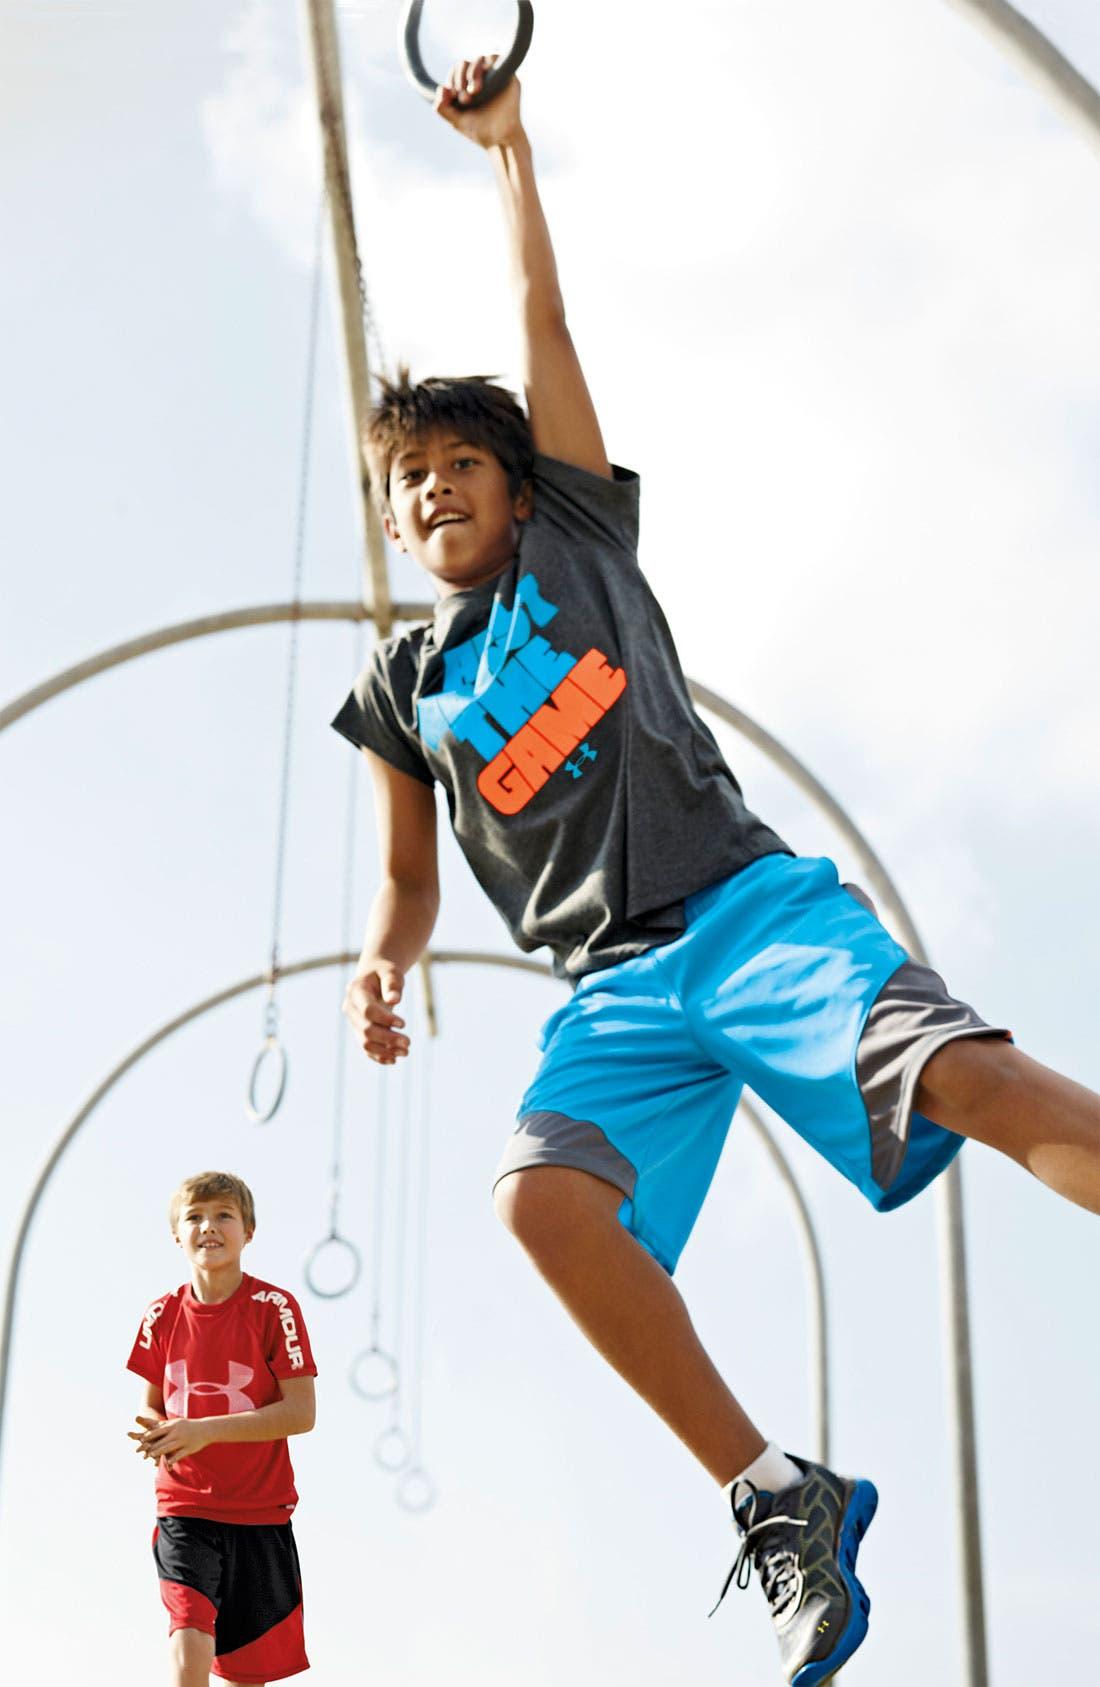 Main Image - Under Armour T-Shirt, Shorts & Sneaker (Big Boys)